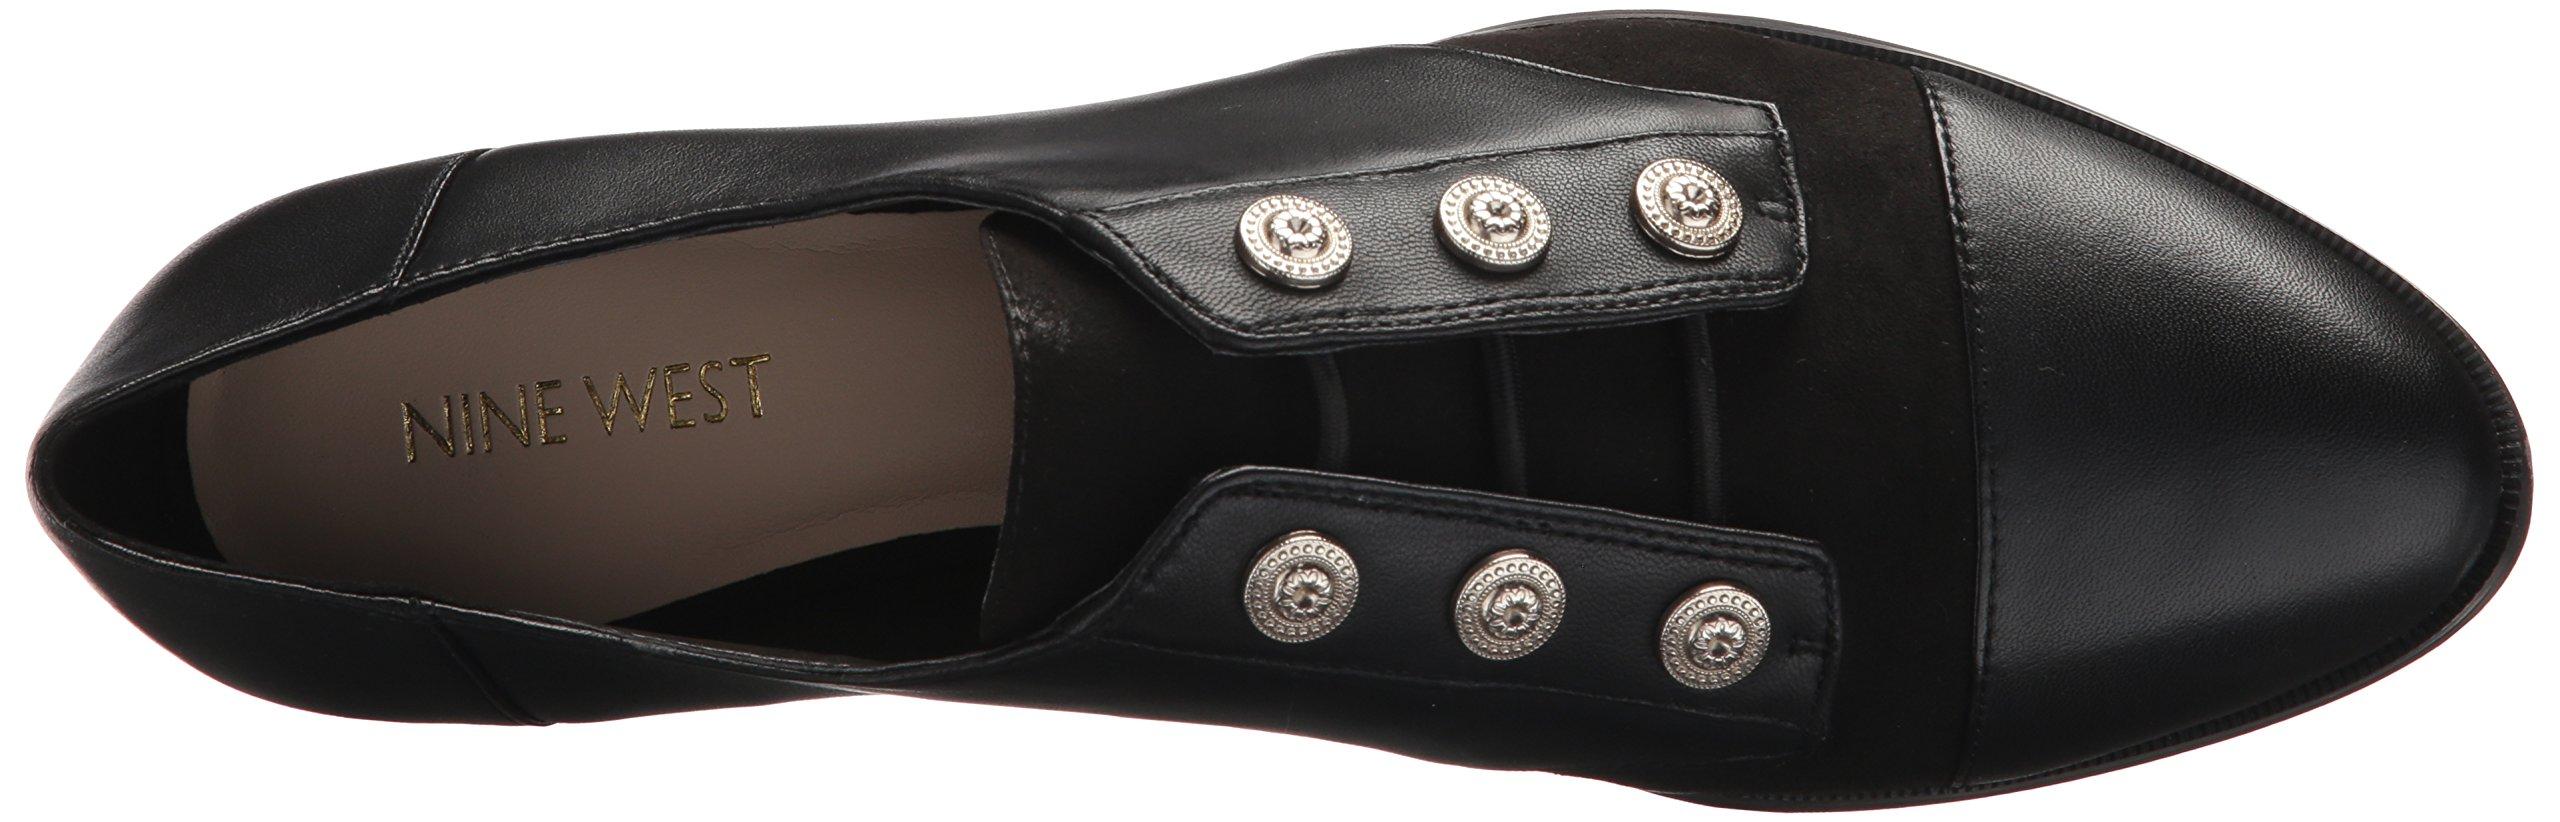 Nine West Women's Here Leather Uniform Dress Shoe, Black/Multi Leather, 5 M US by Nine West (Image #8)